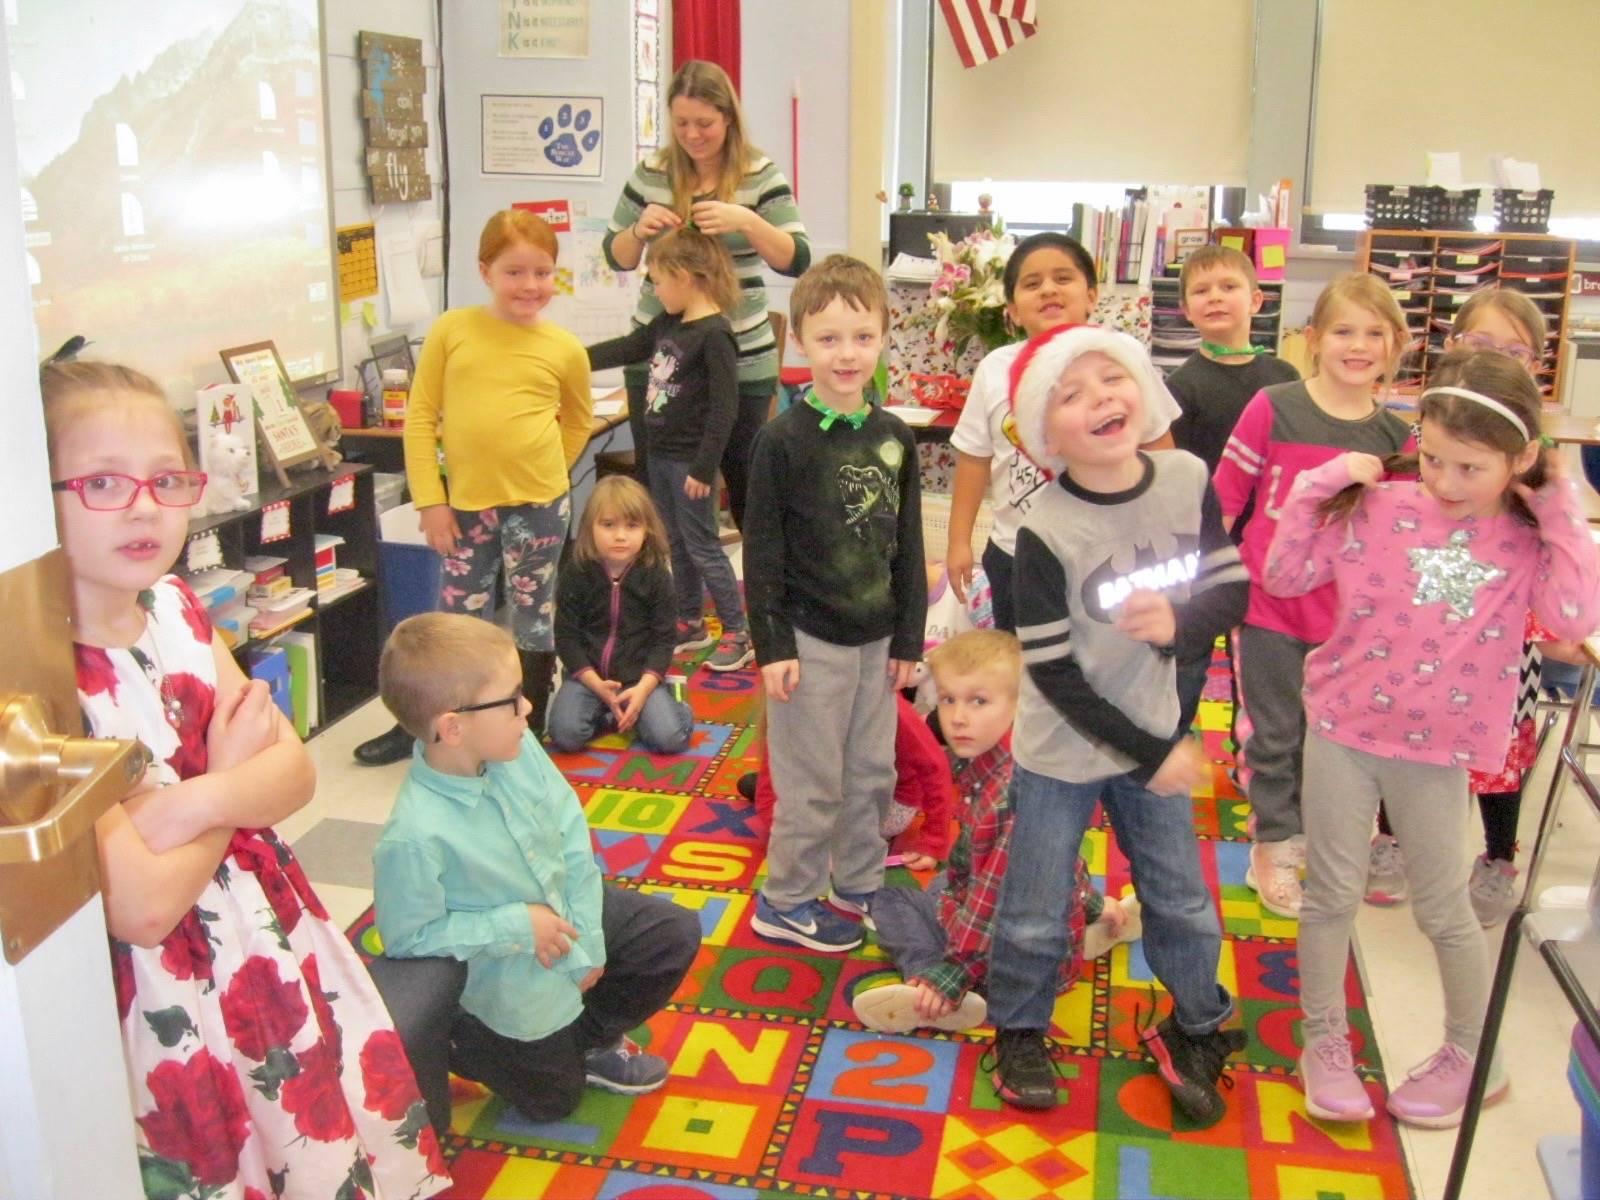 A class shows their Holiday spirit.